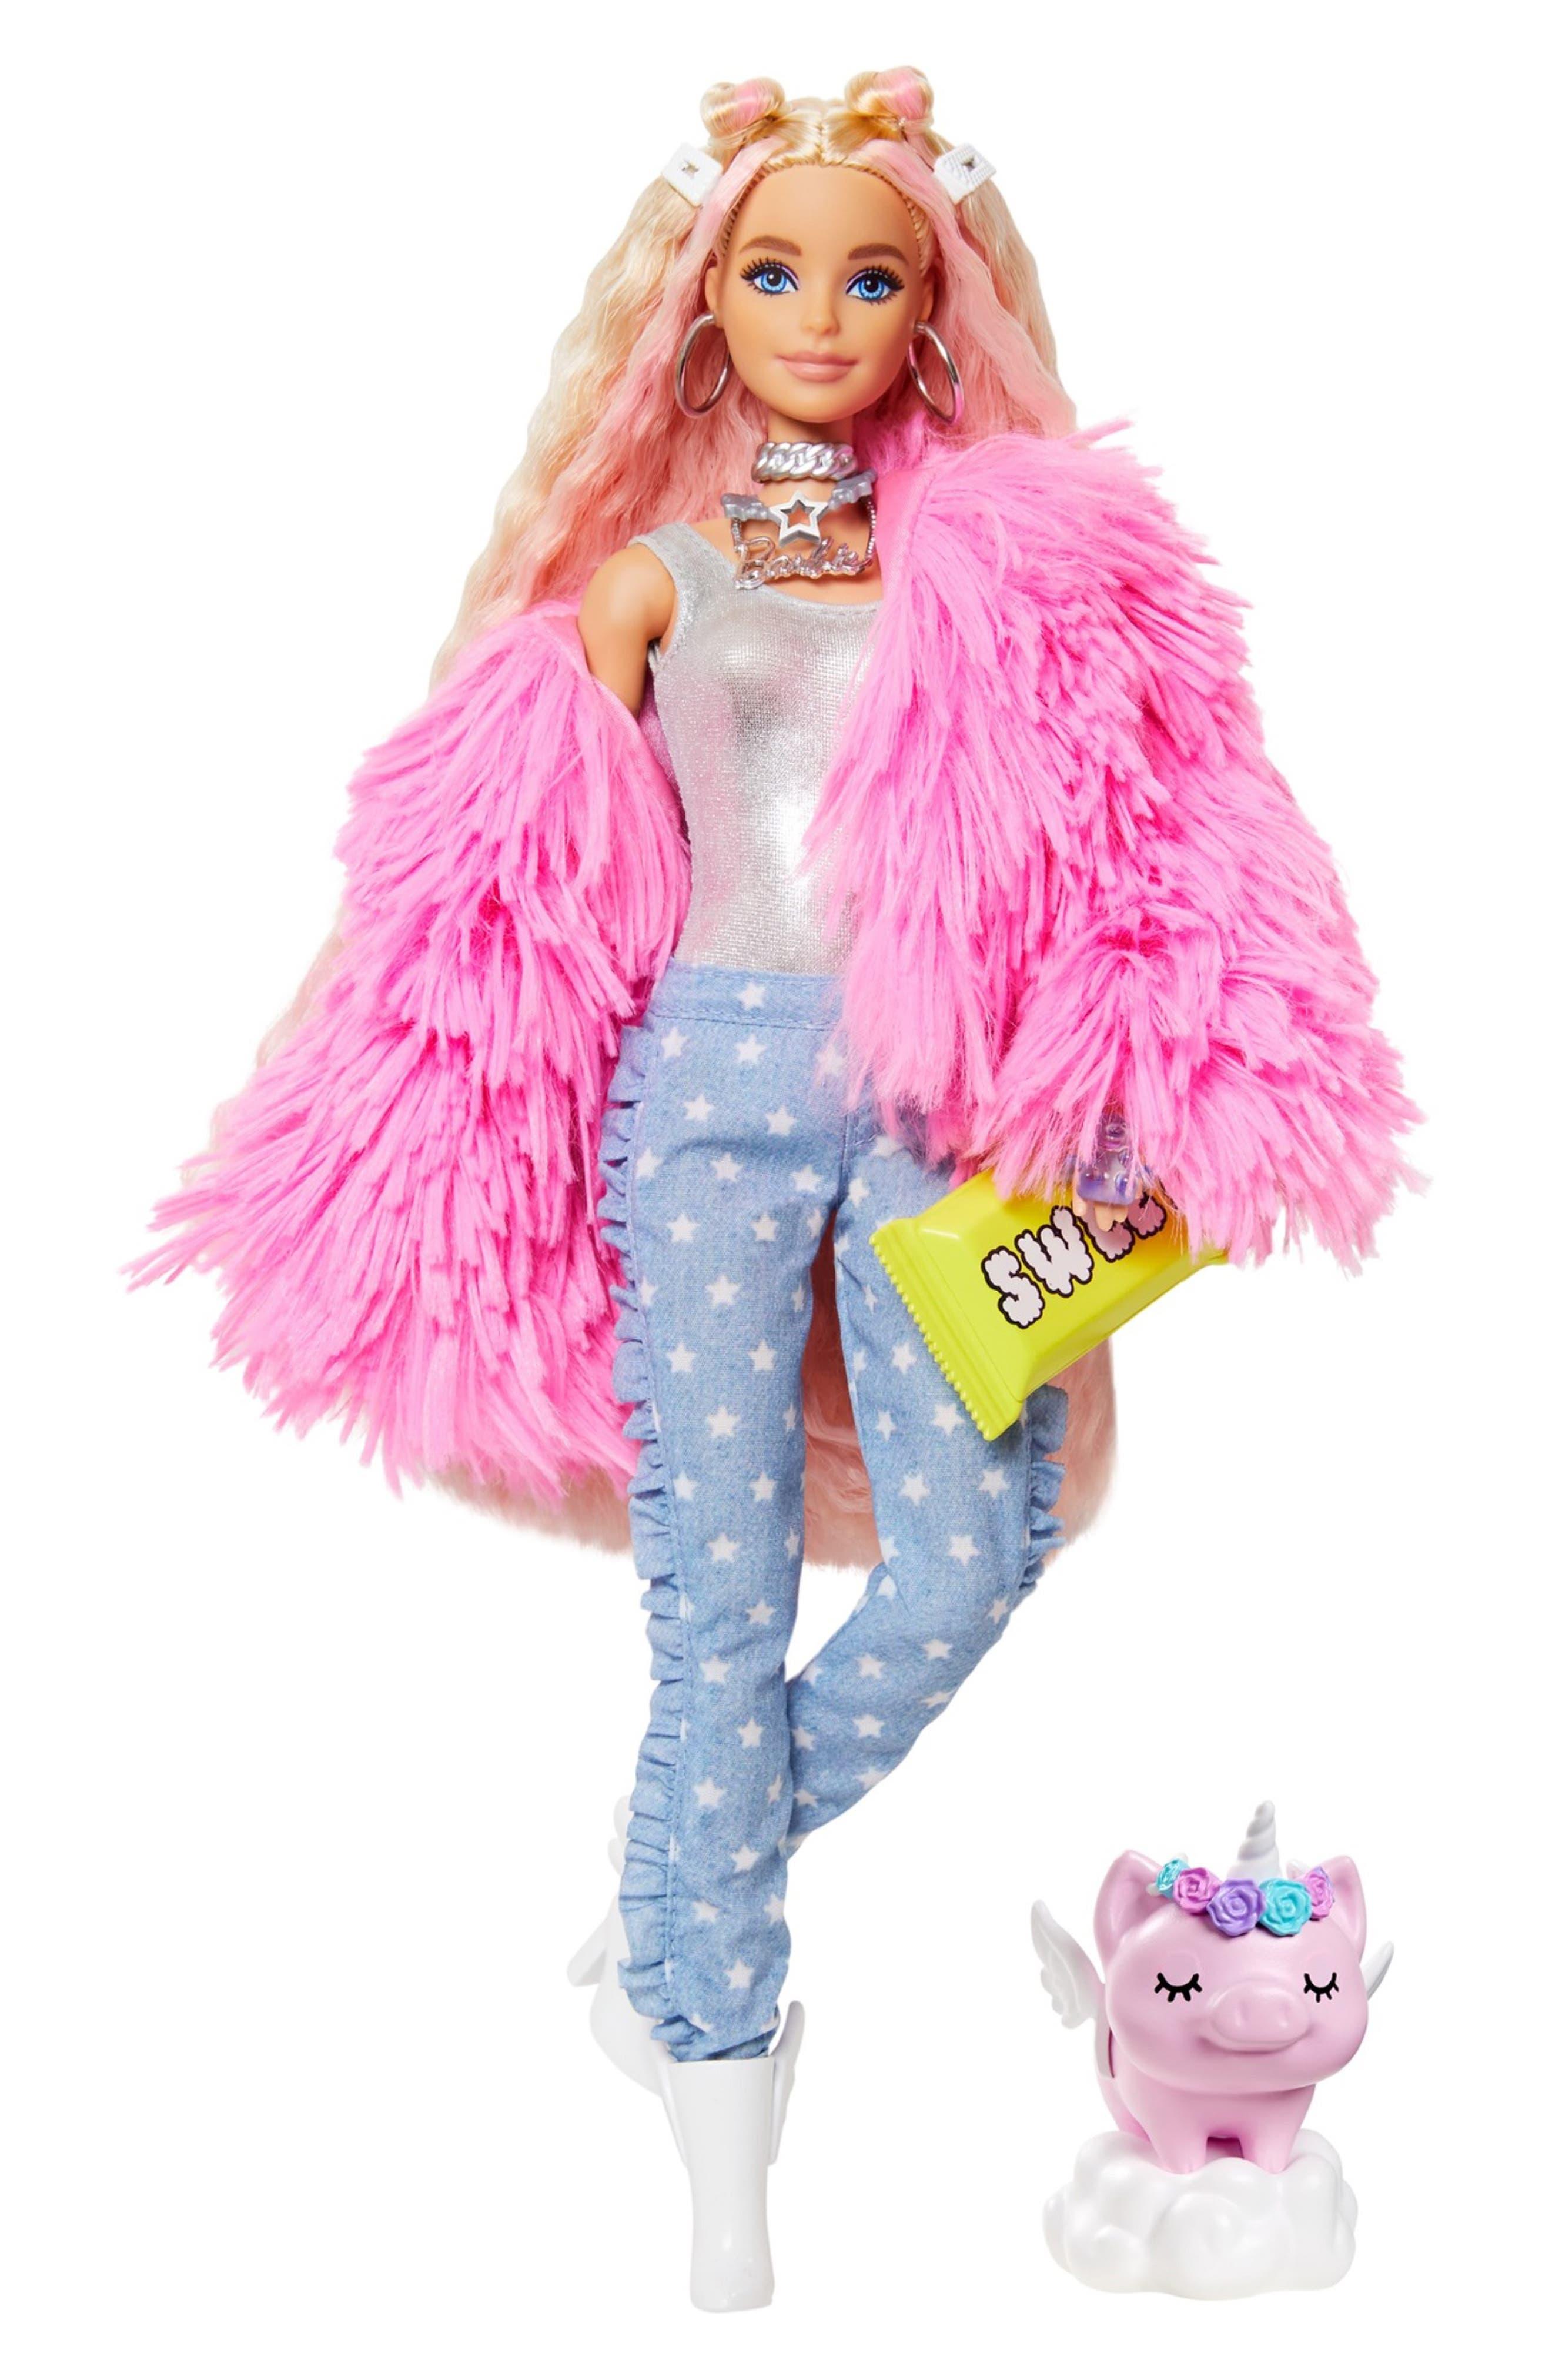 Image of Mattel Barbie(R) Extra Doll - Fluffy Pink Jacket